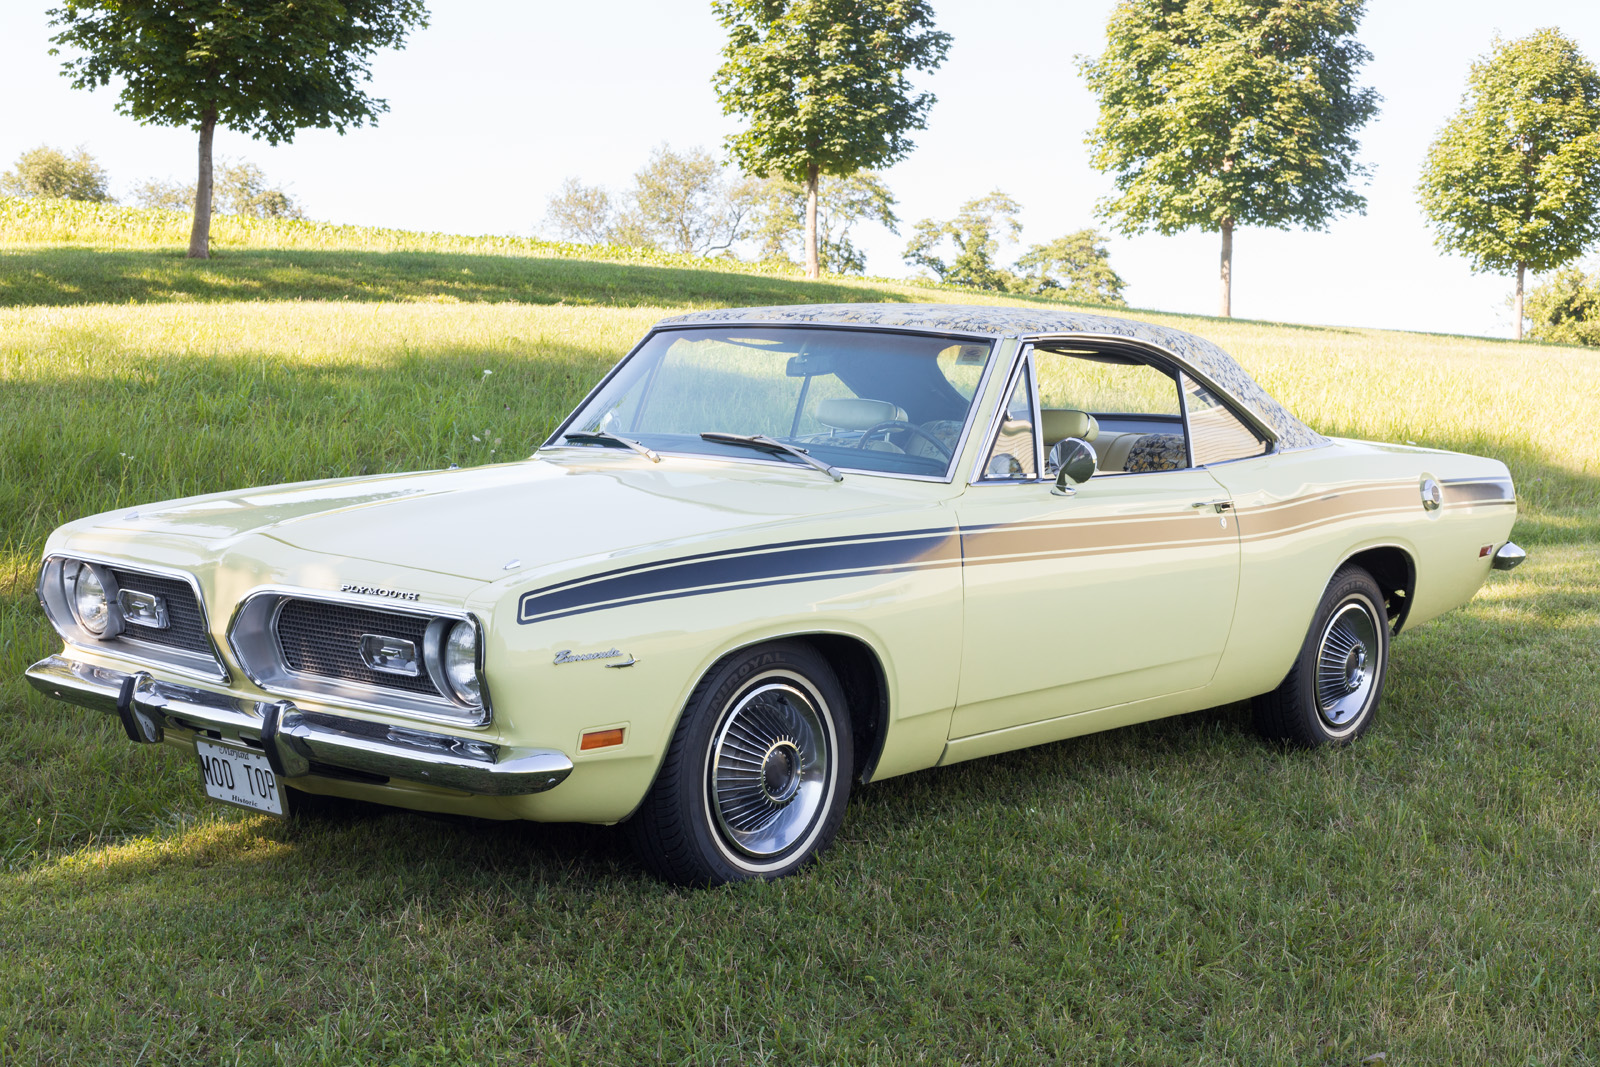 '69 Barracuda Mod Topone